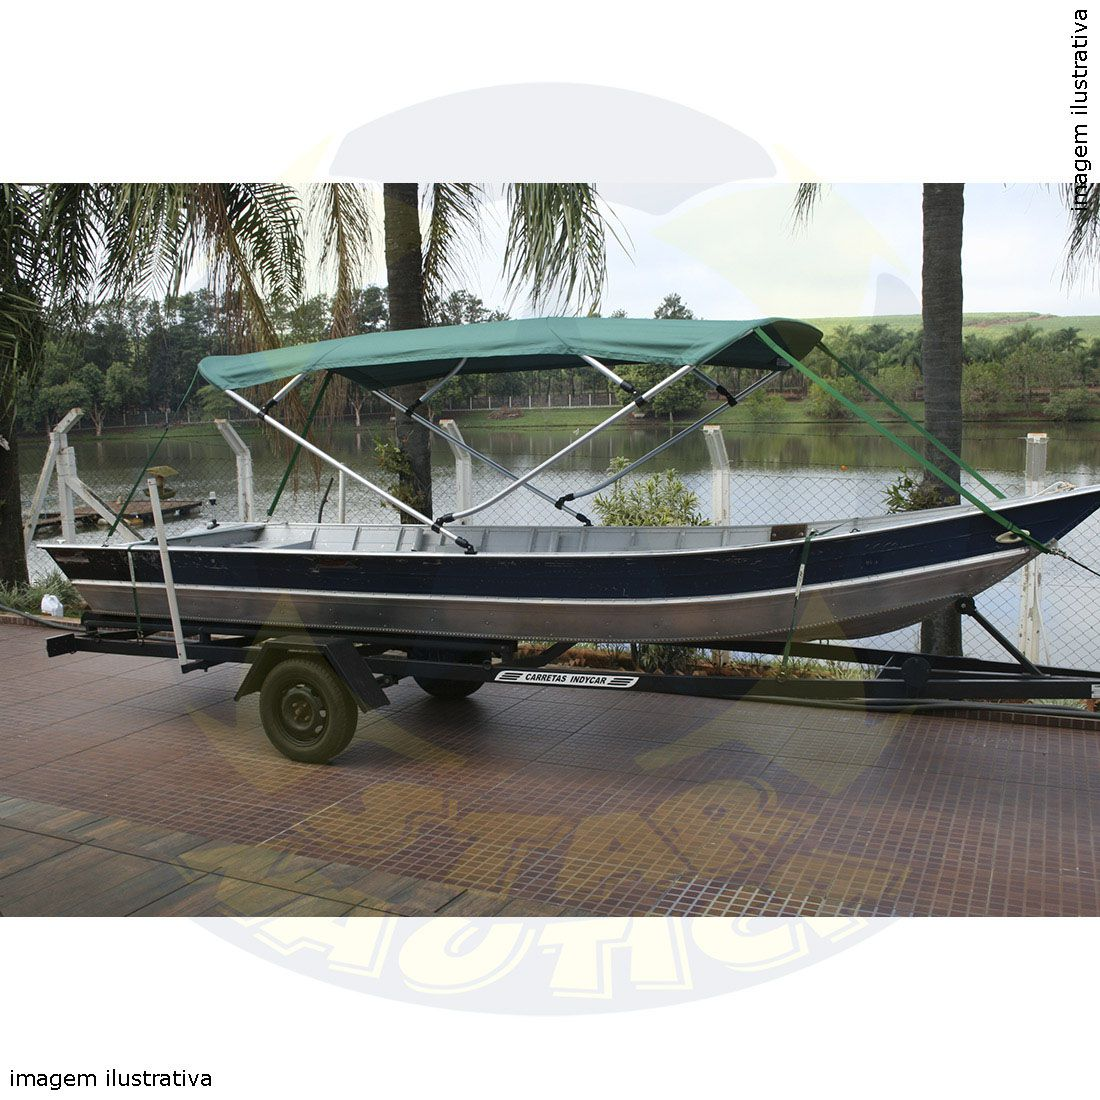 Capota Toldo Barco Big Fish 5016 Poliéster 4 Arcos Tubo 7/8